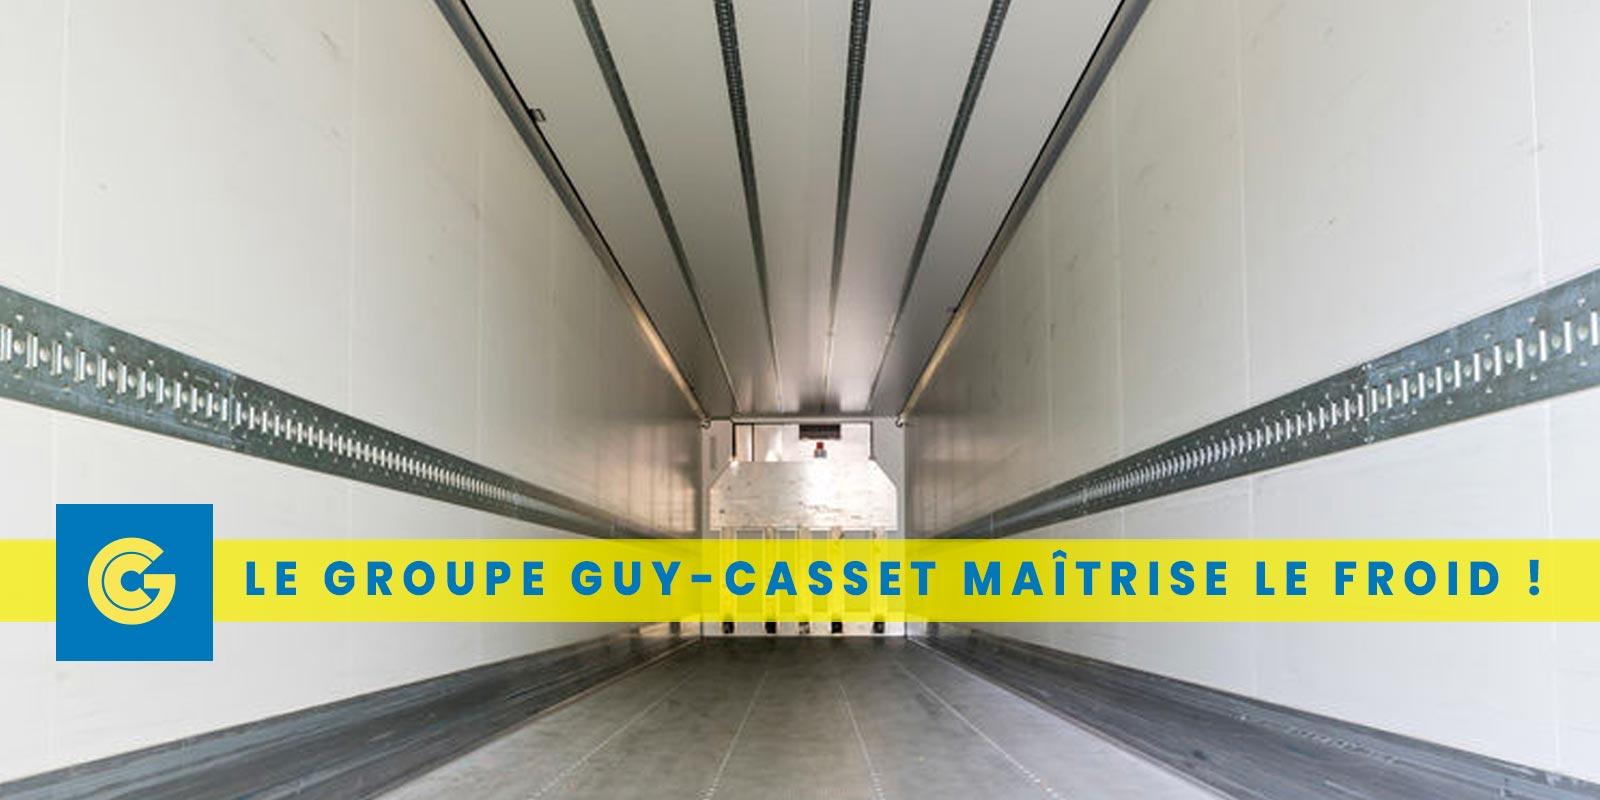 Transport TD: le Groupe Guy-Casset maîtrise le froid!